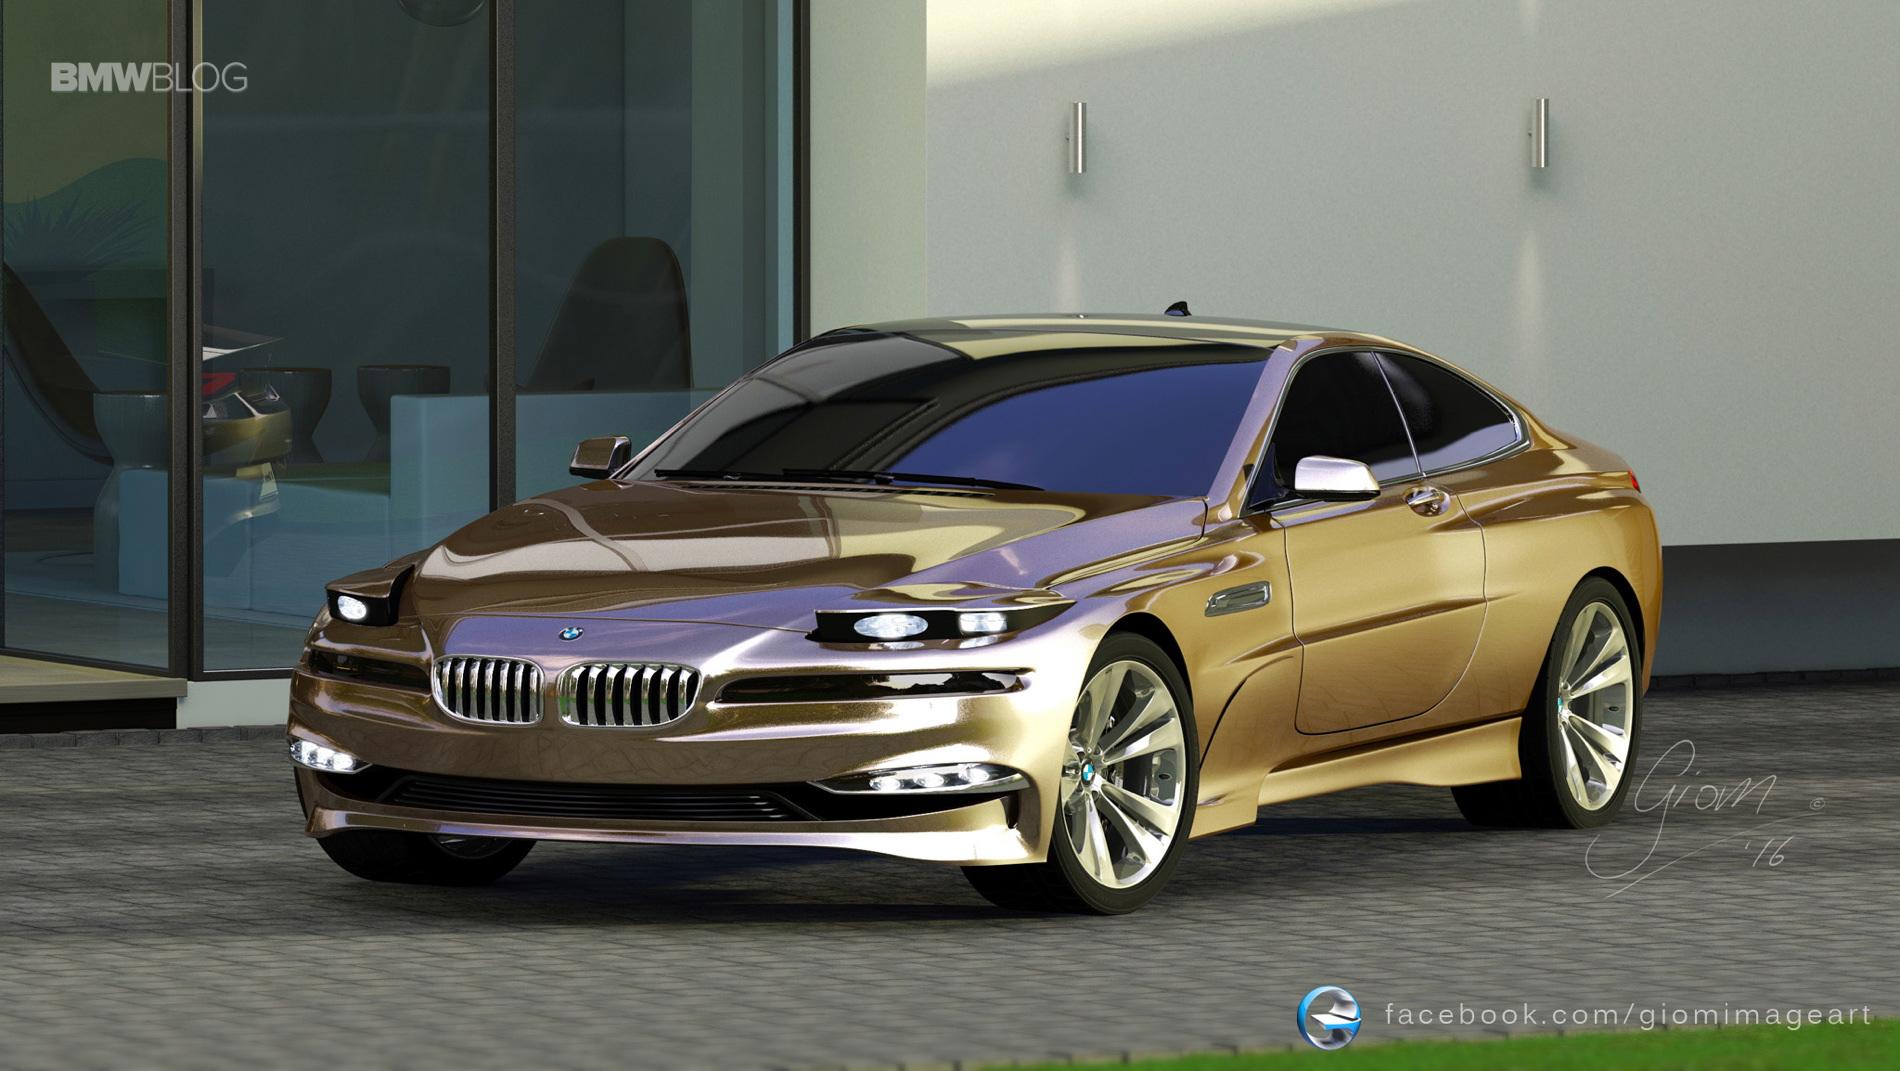 BMW 8 Series Tribute - Design Study